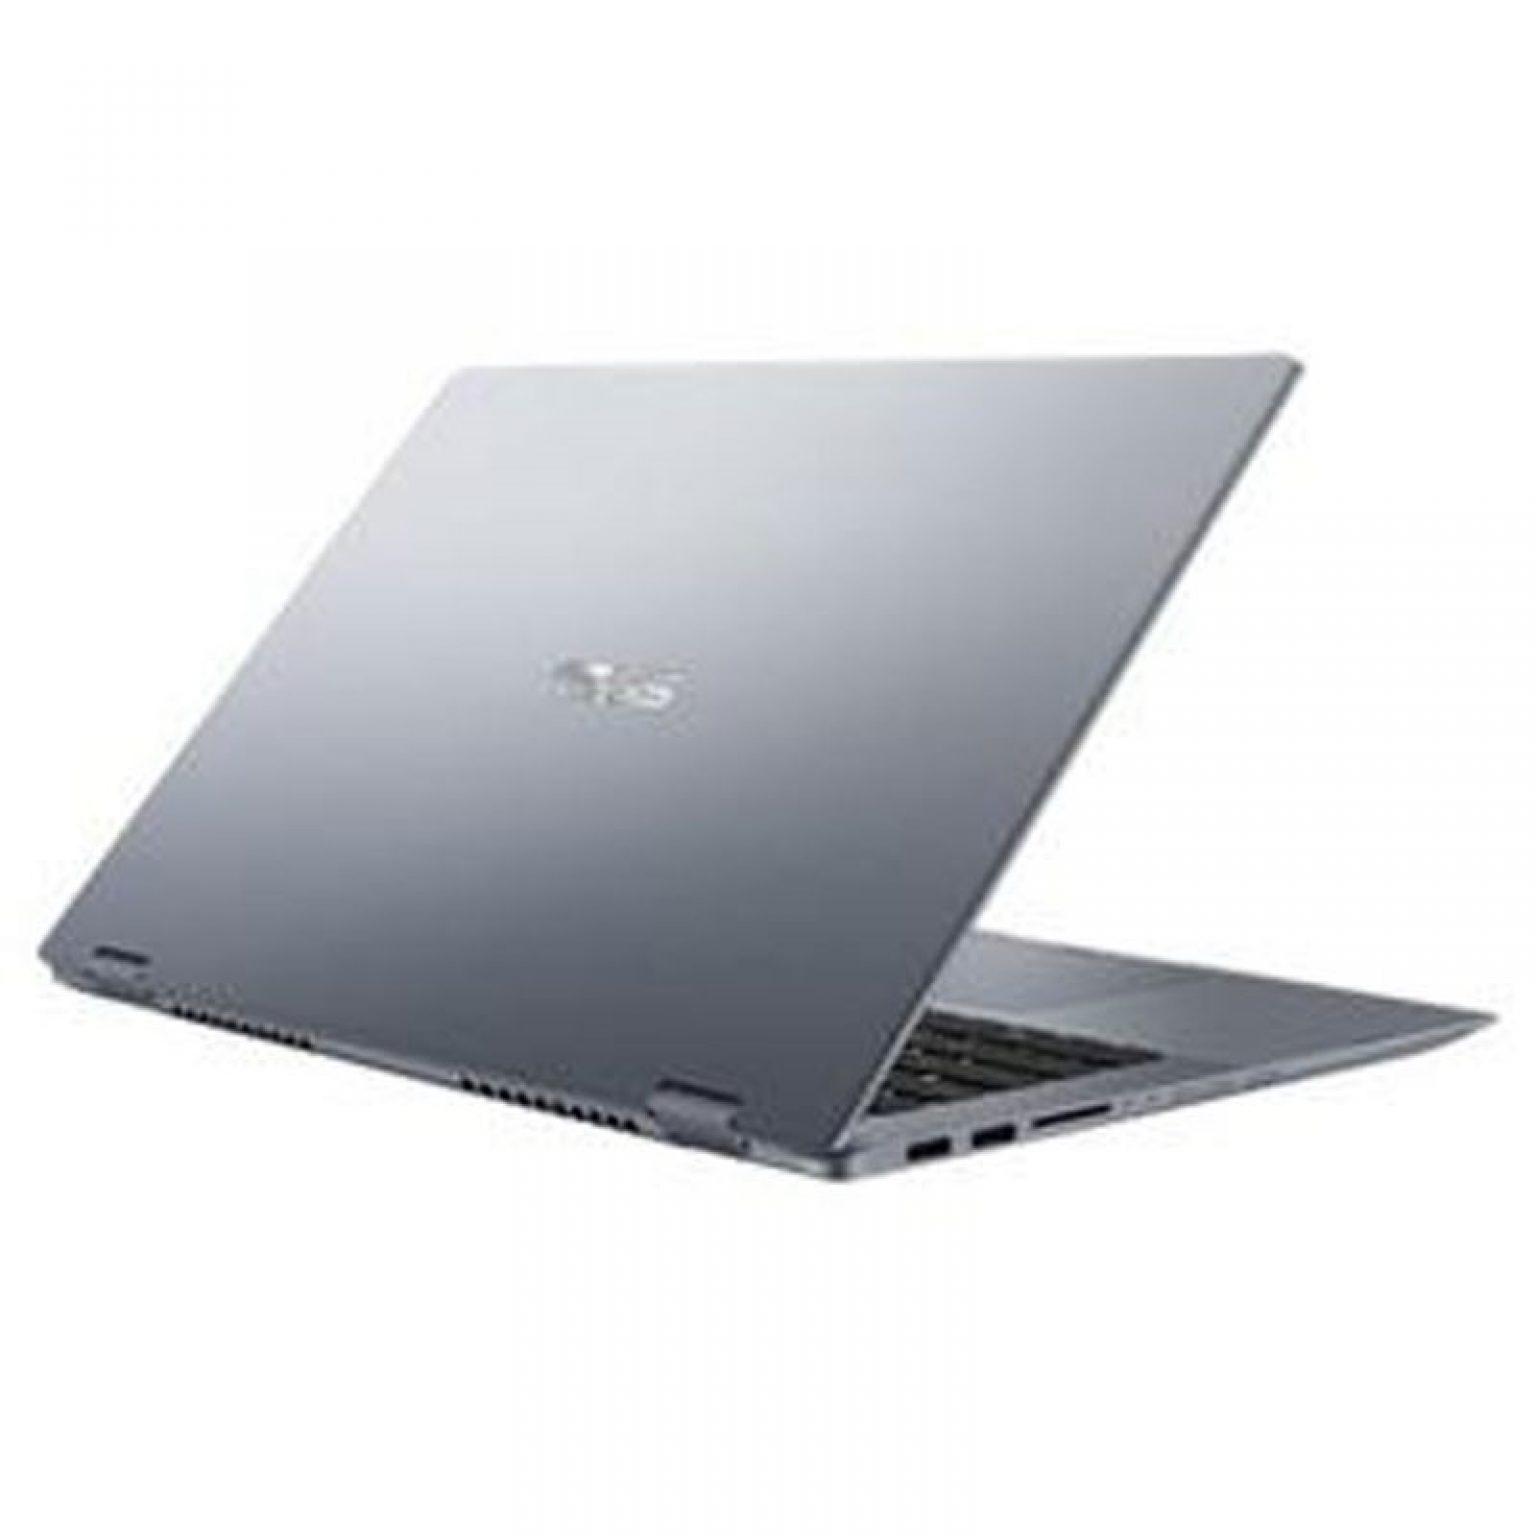 ASUS - VivoBook Flip TP412UA-EC501T (i5-8250U/4GB RAM/256GB/14inch/Win10SL/Star Grey)